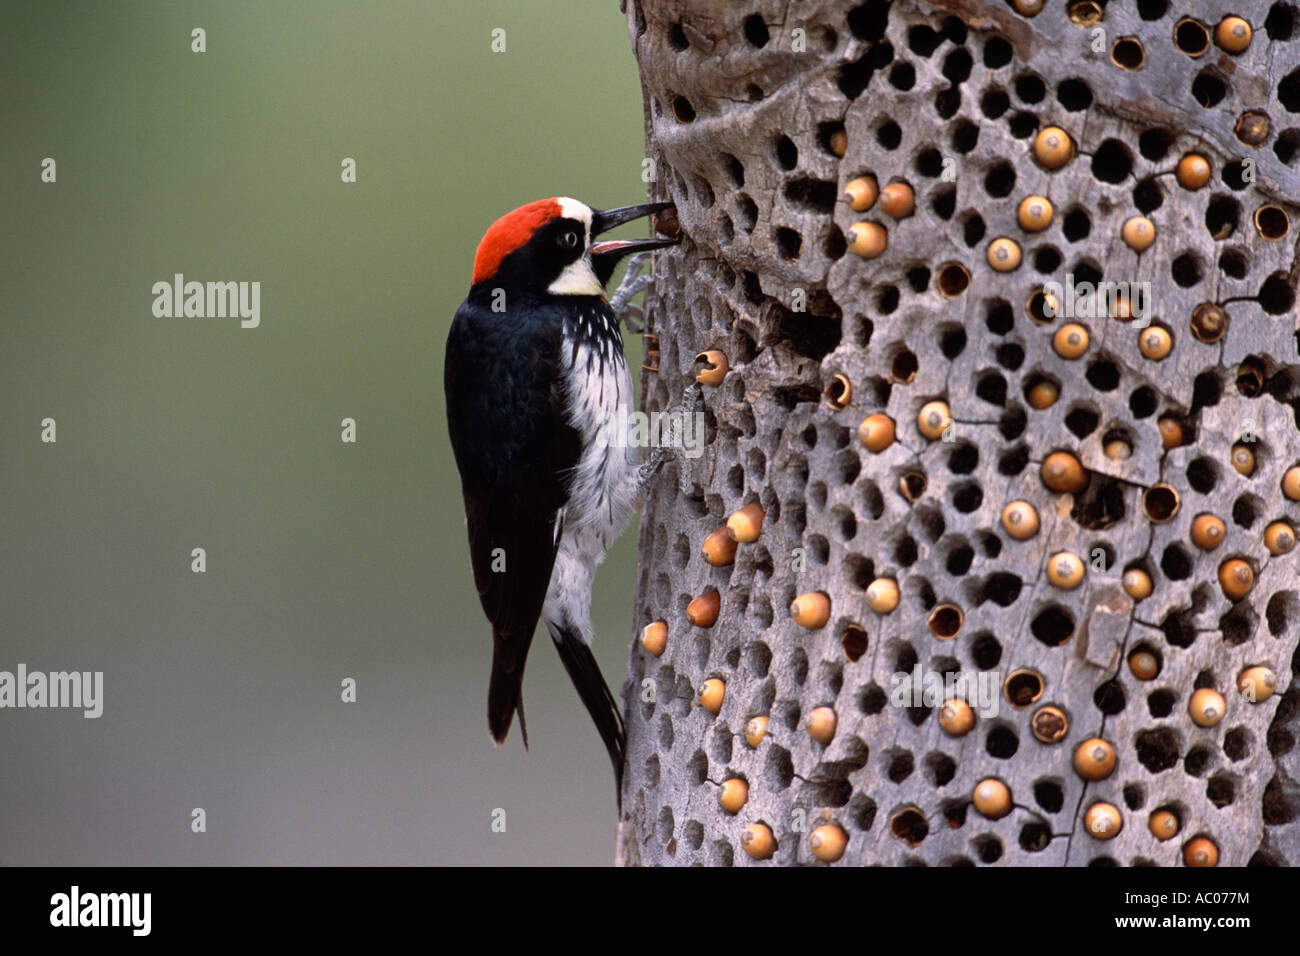 Acorn Woodpecker Storing Acorns - Stock Image